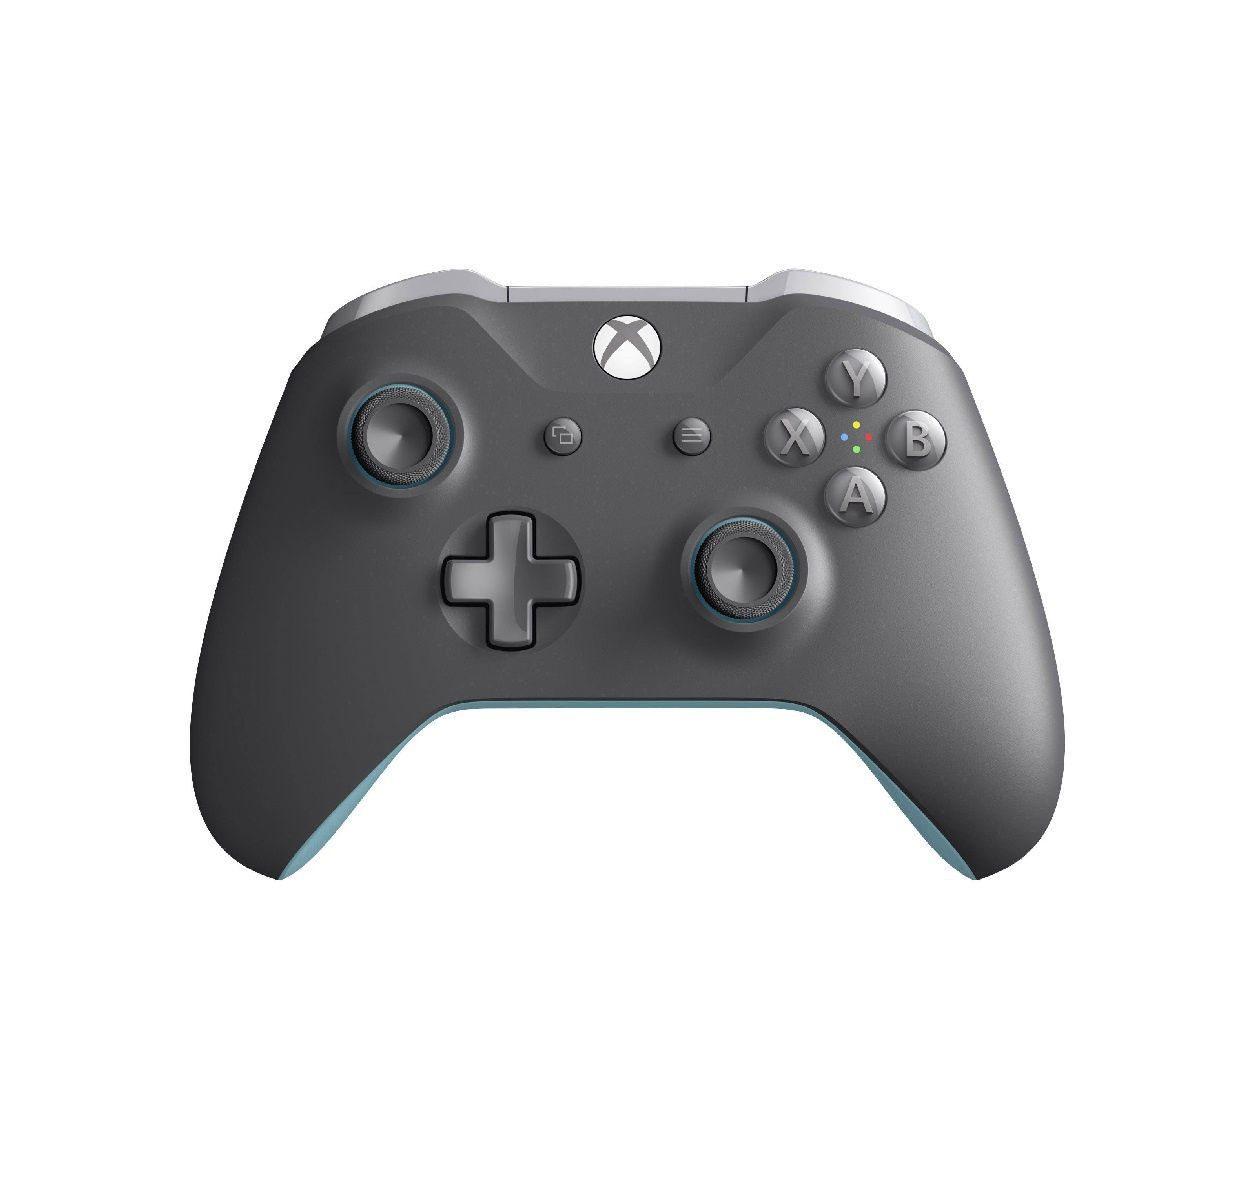 Геймпад для Xbox One (серый голубой)